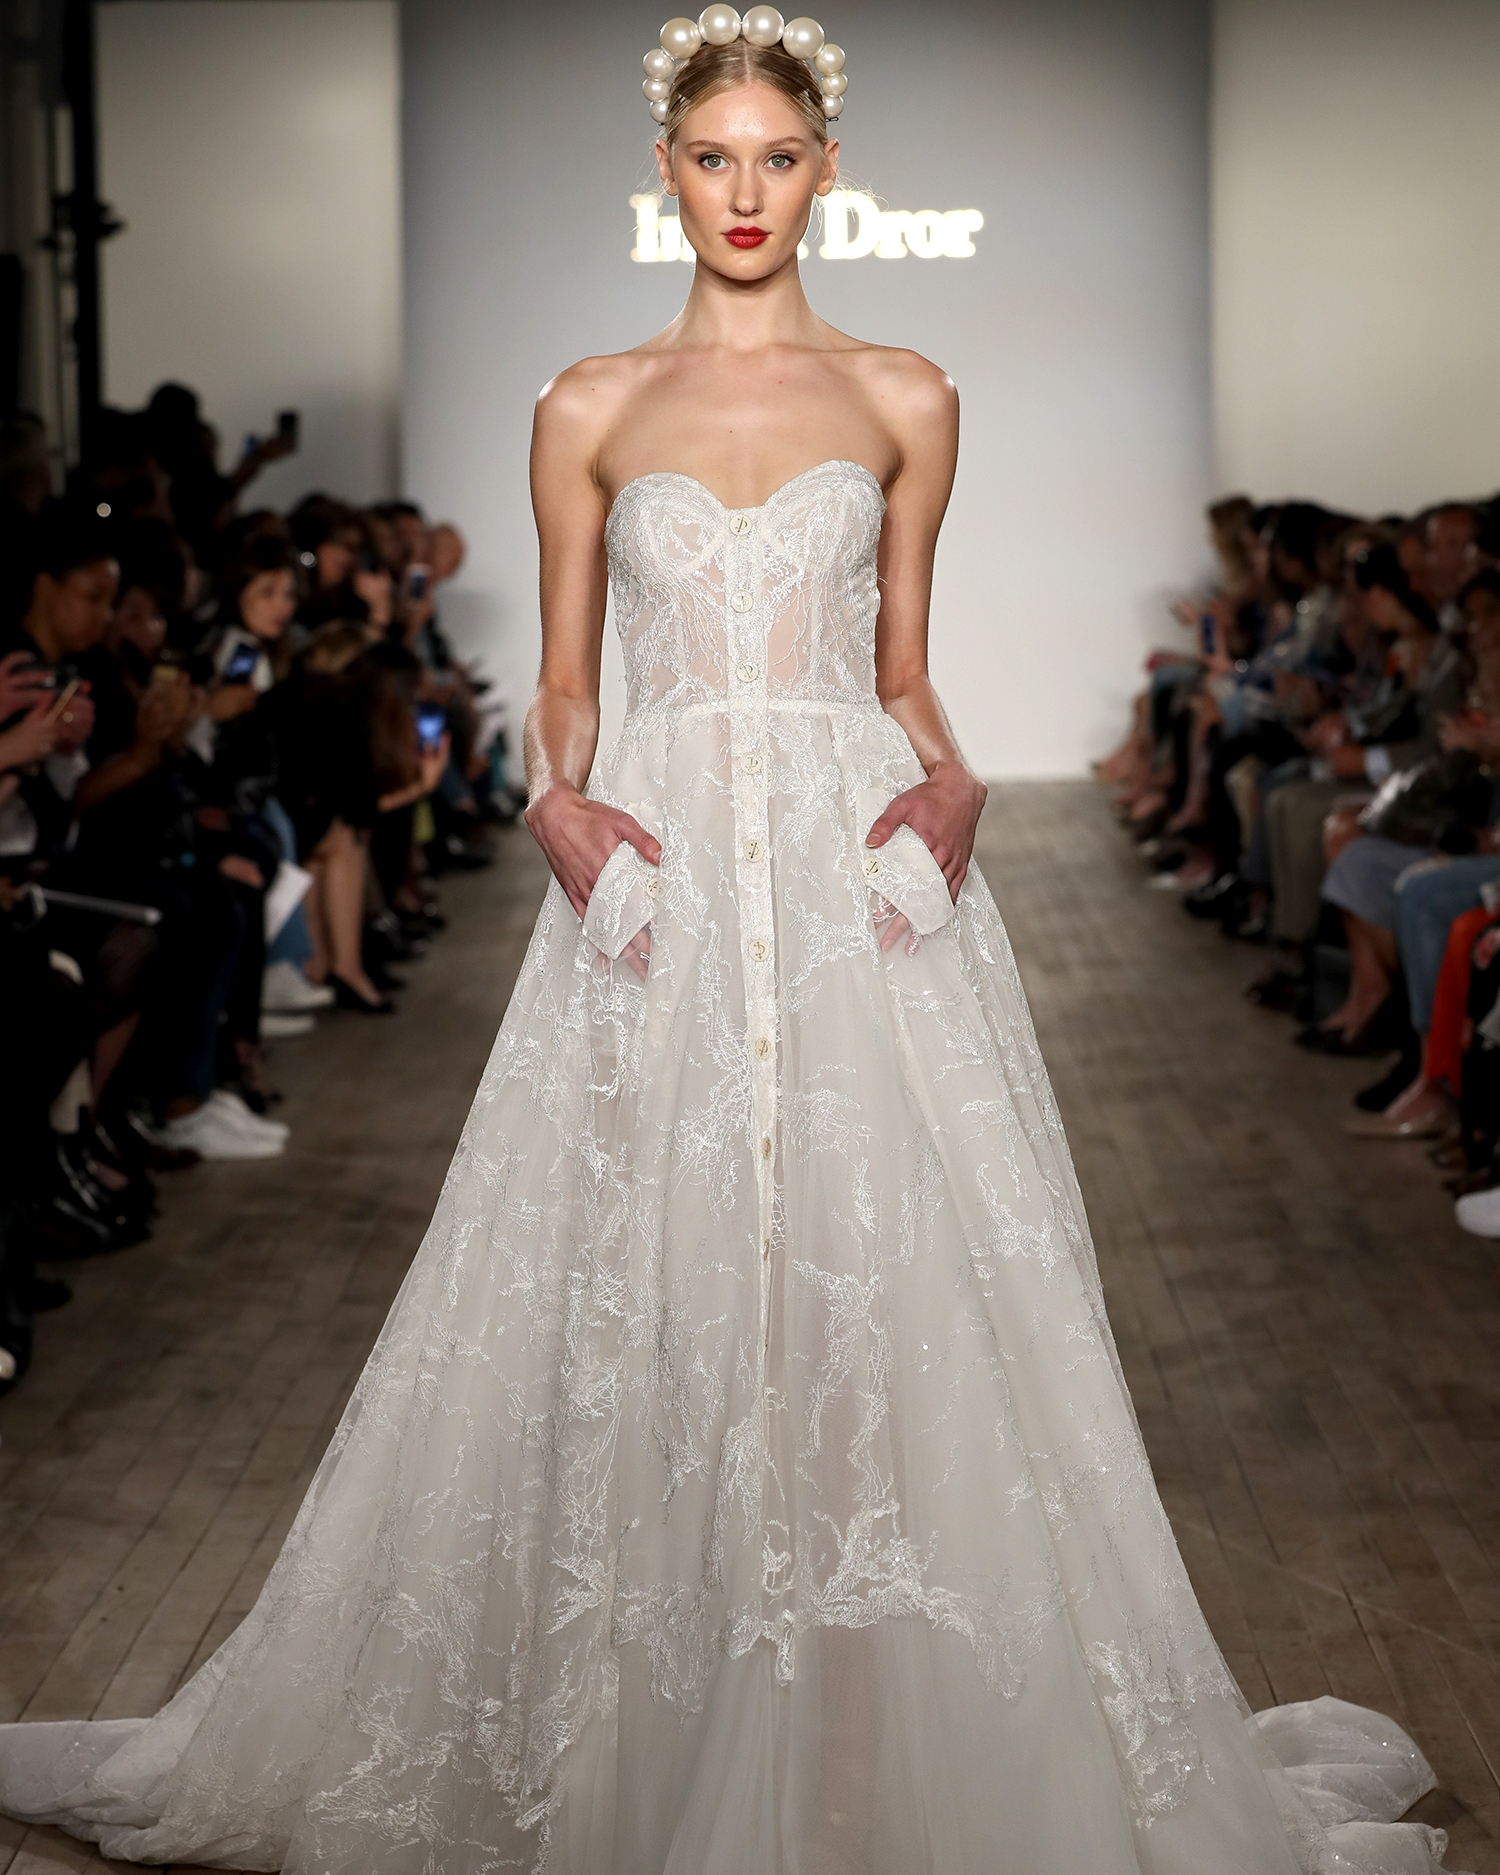 inbal dror wedding dress sweetheart a-line with button details